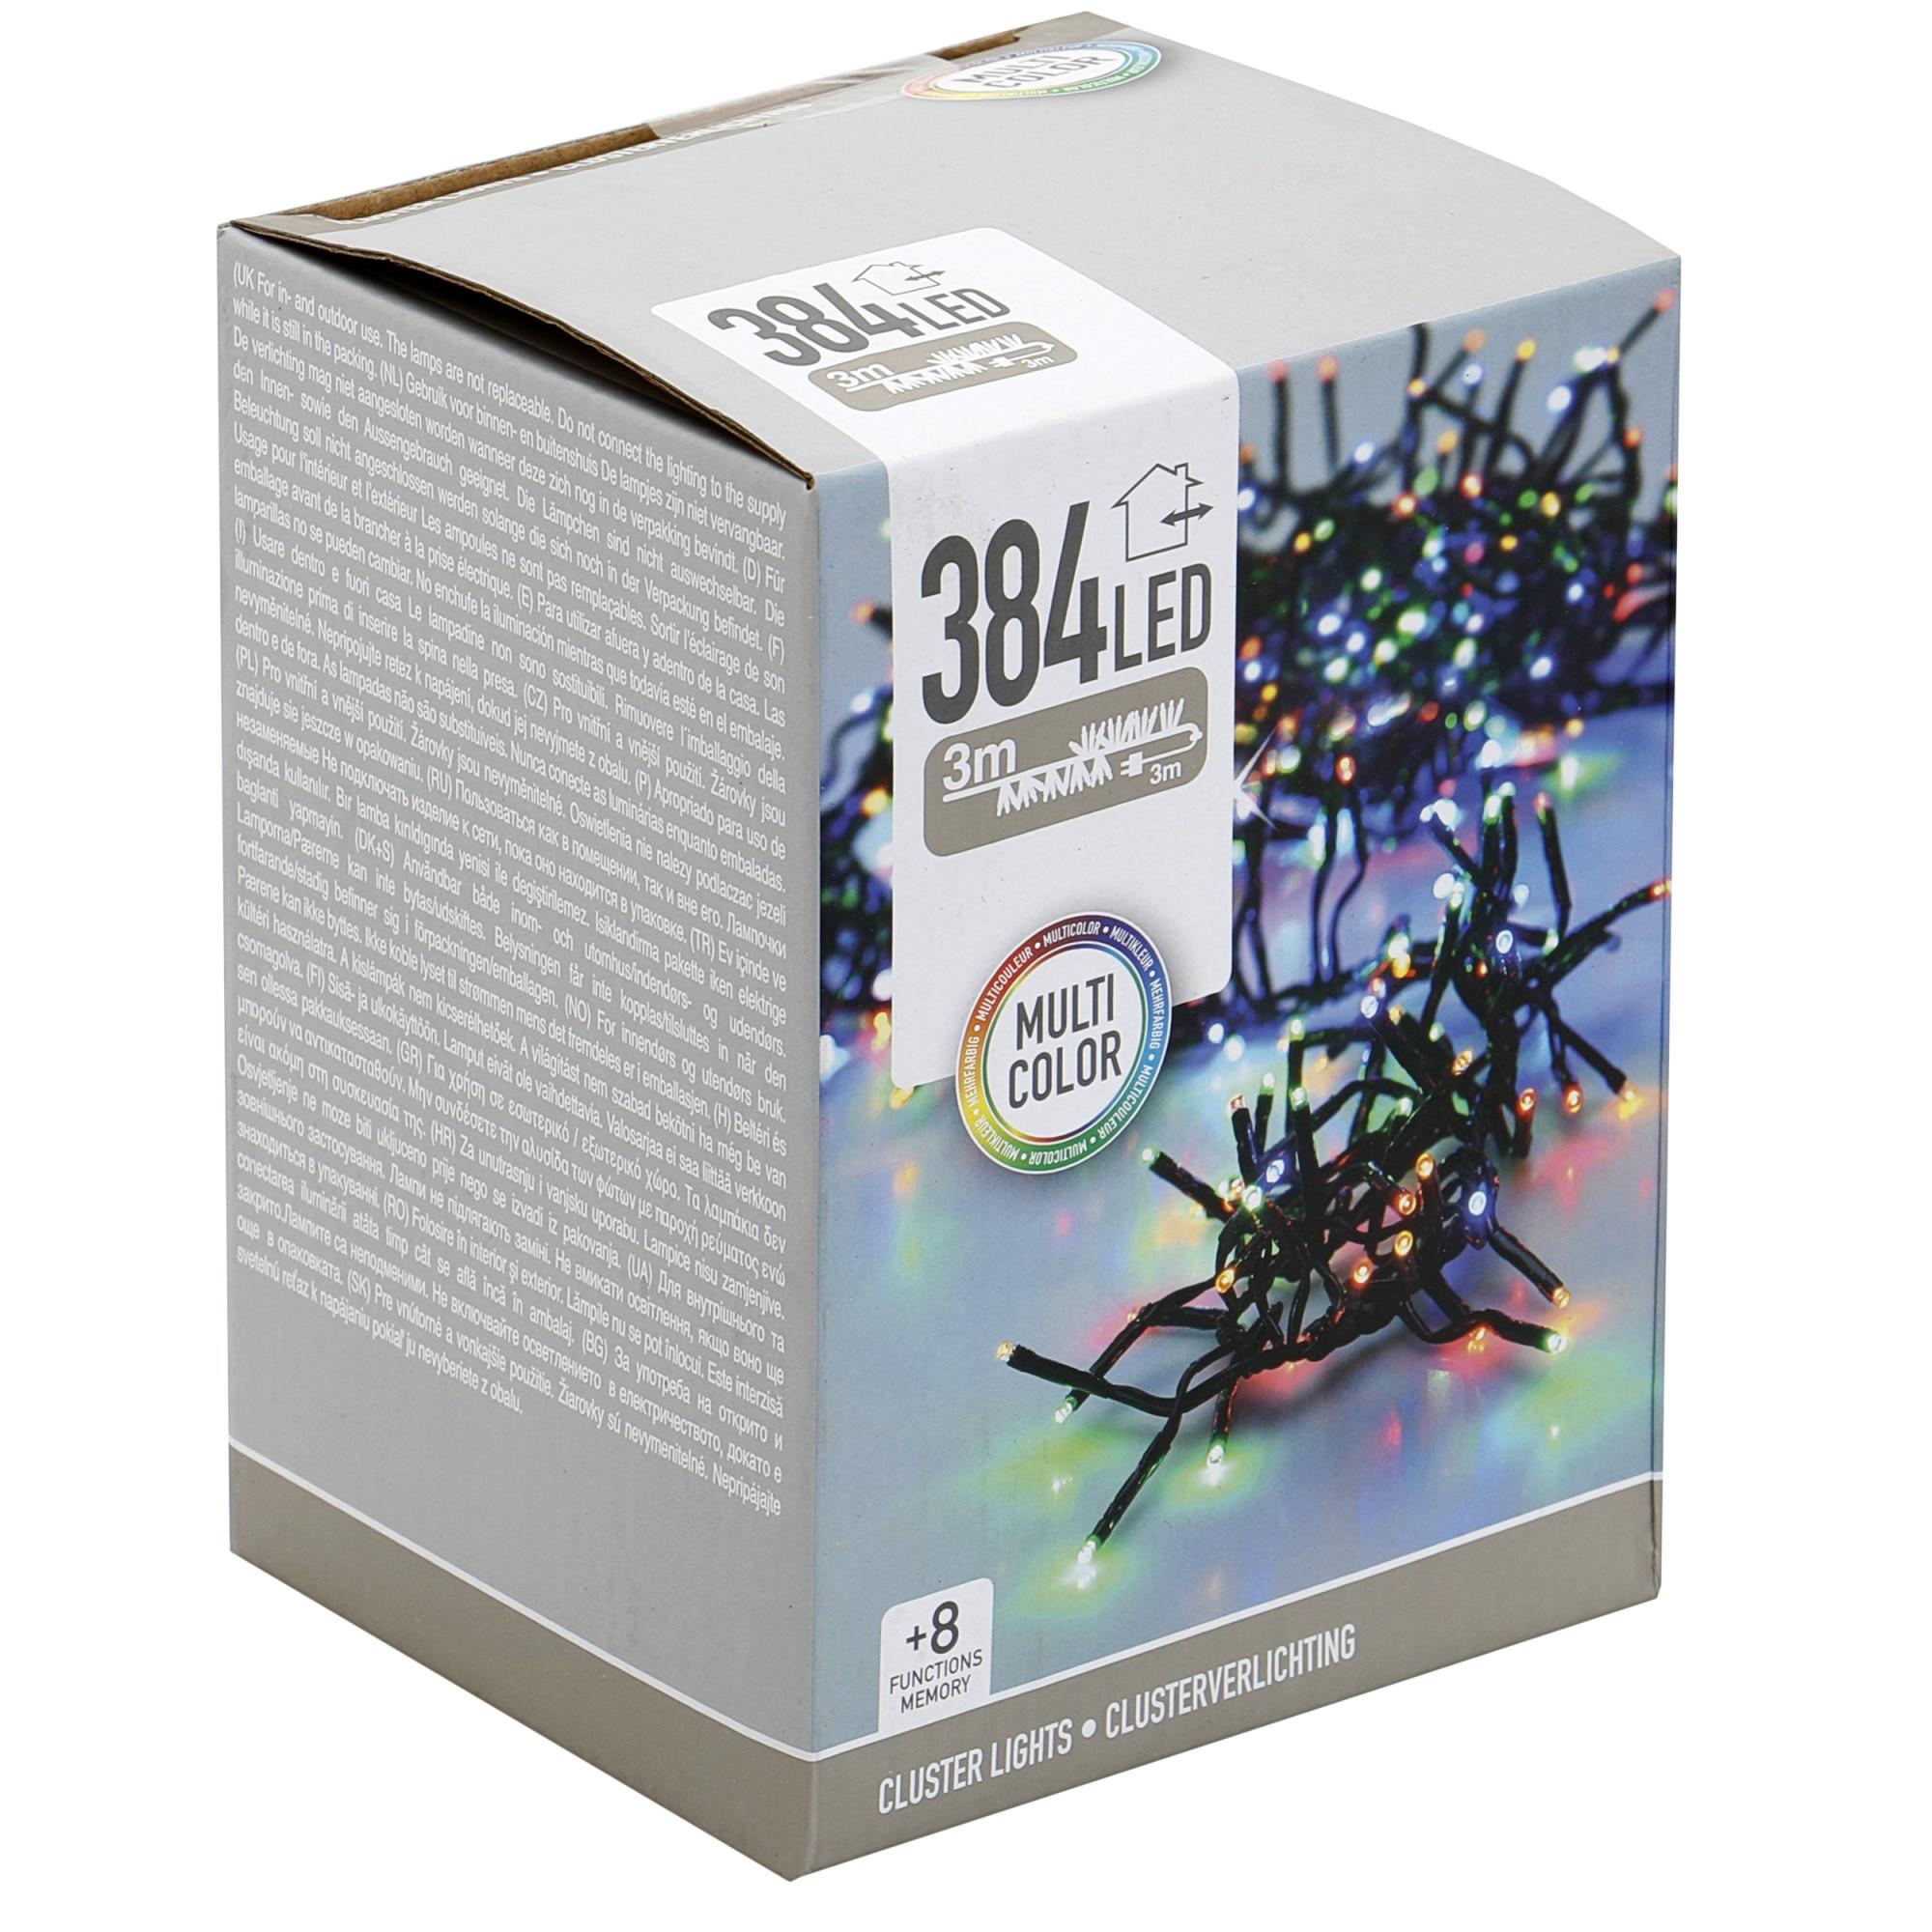 Fotografie Instalatie cluster multiLED eNoelle, 384 LED-uri multicolore, 3 mm, 3 m